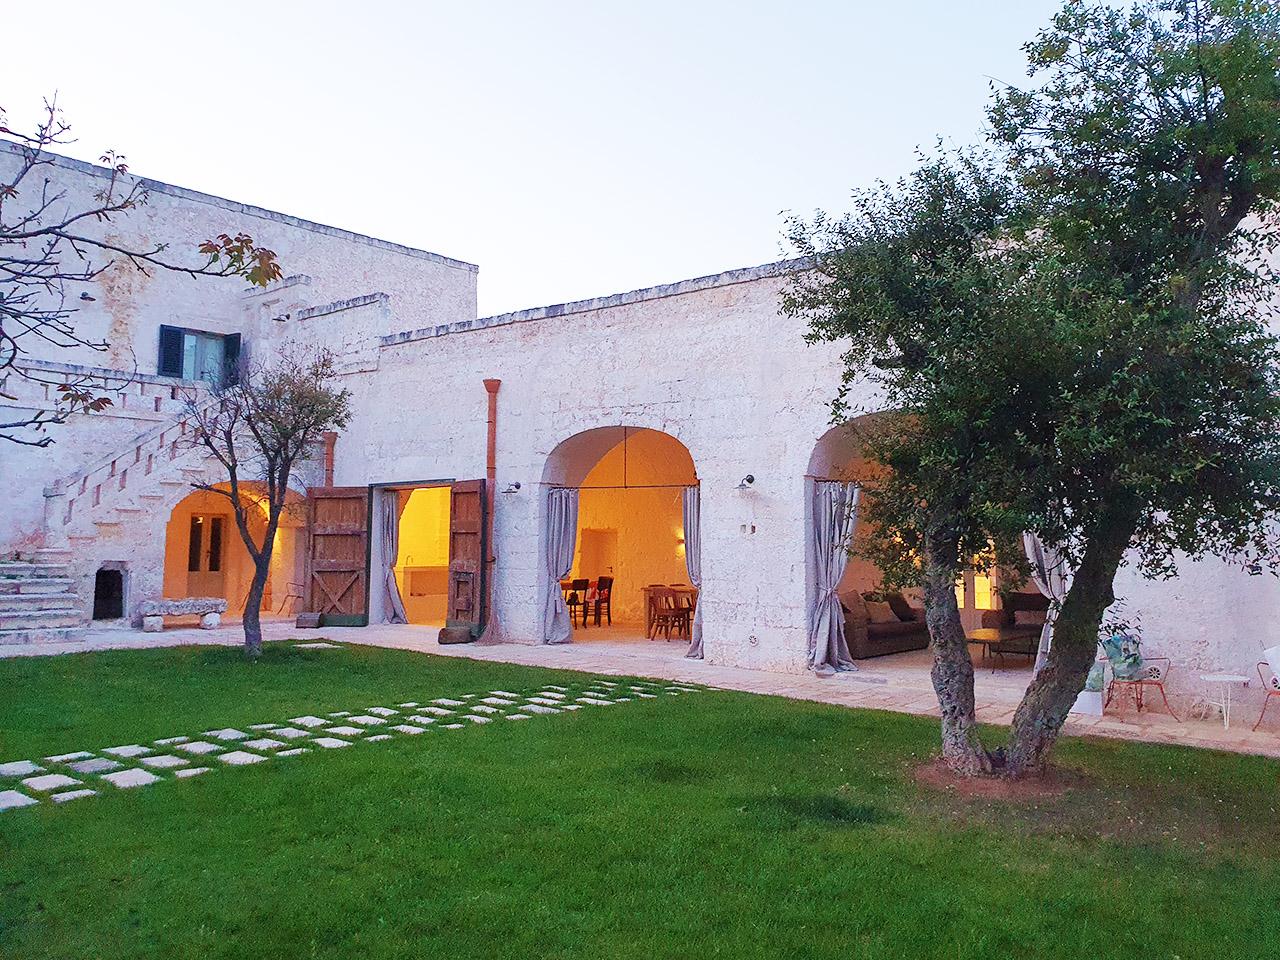 costruzioni restauri sirio ostuni restauro ristrutturazione masseria mangiamuso ostuni 20200509 200353